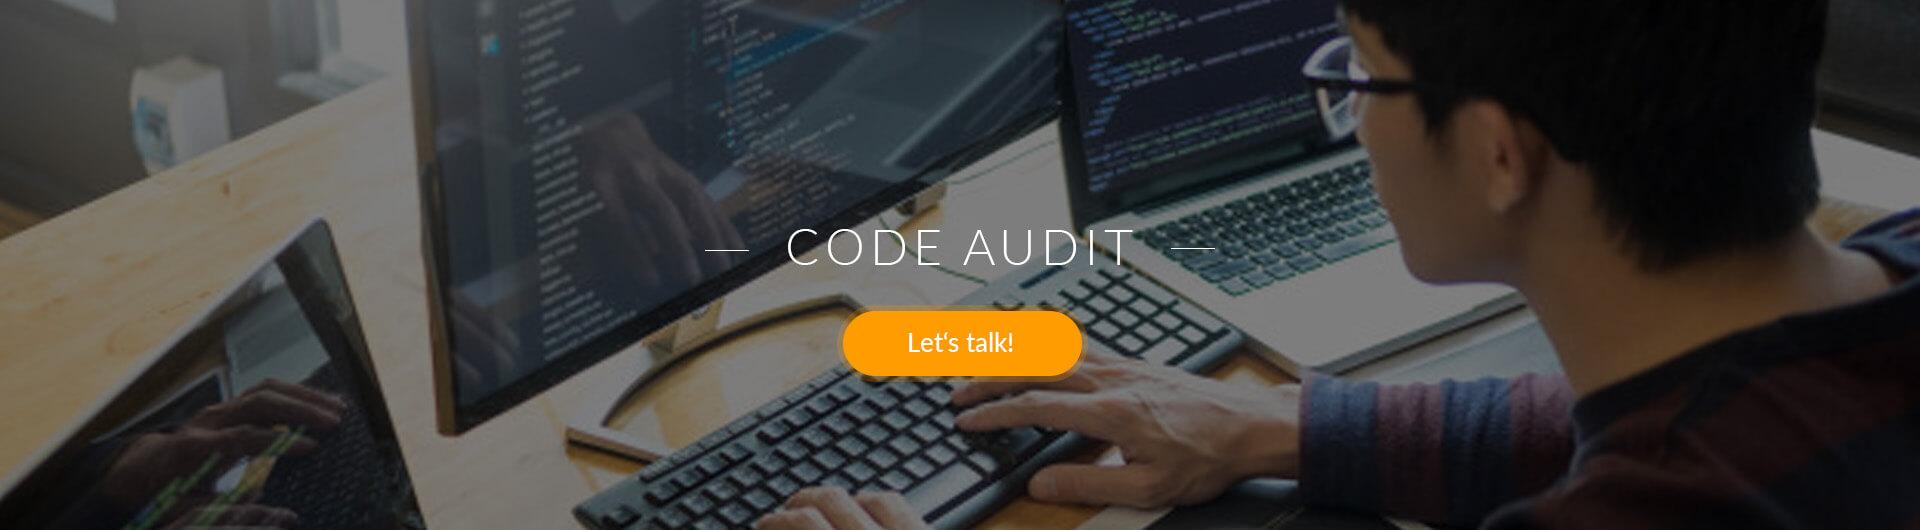 magento code audit